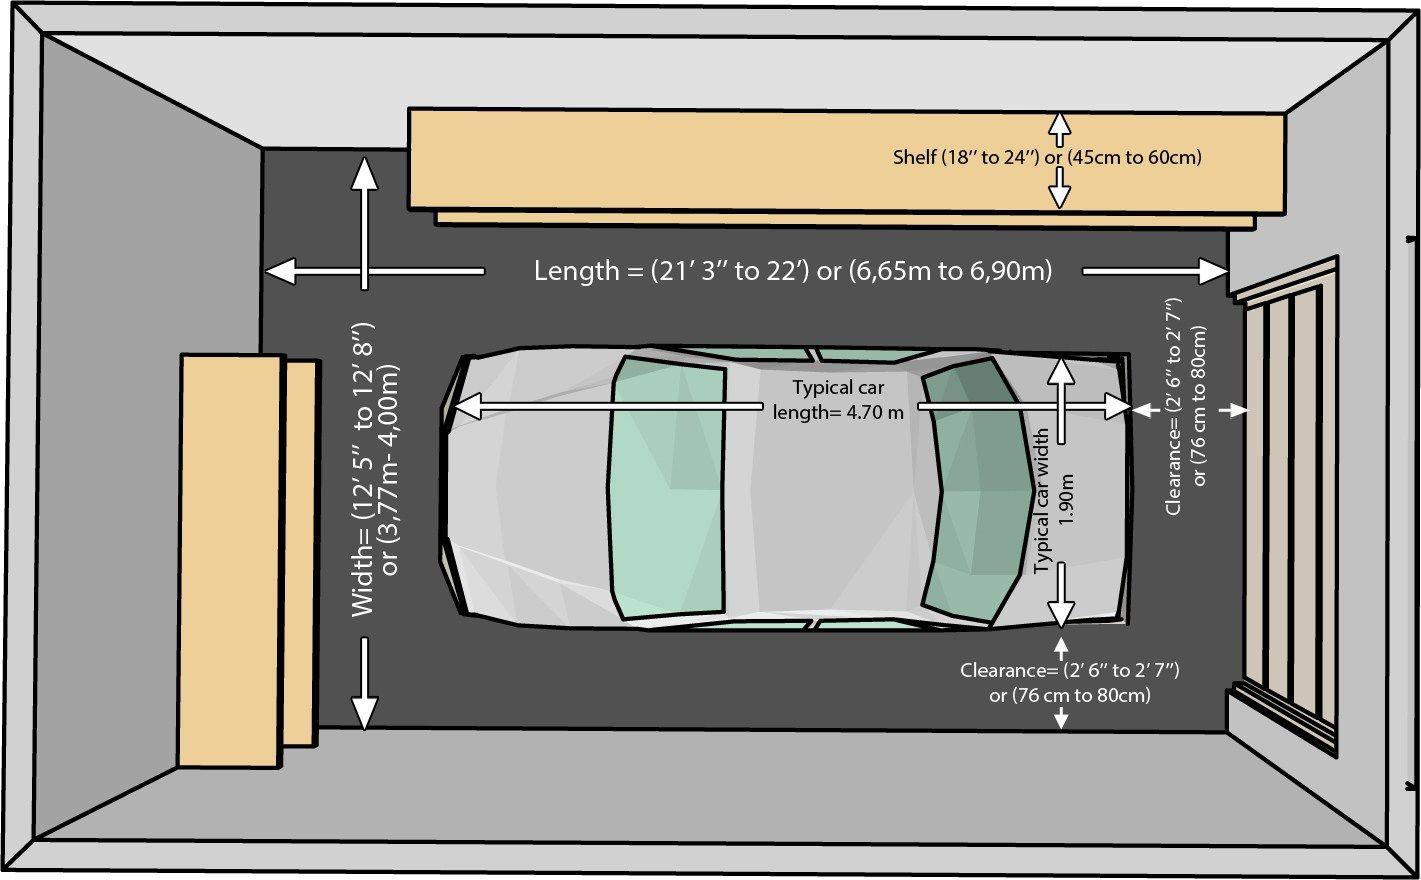 Double Car Garage Size Htjvj Double Car Garage Size Htjvj Desain Eksterior Desain Eksterior